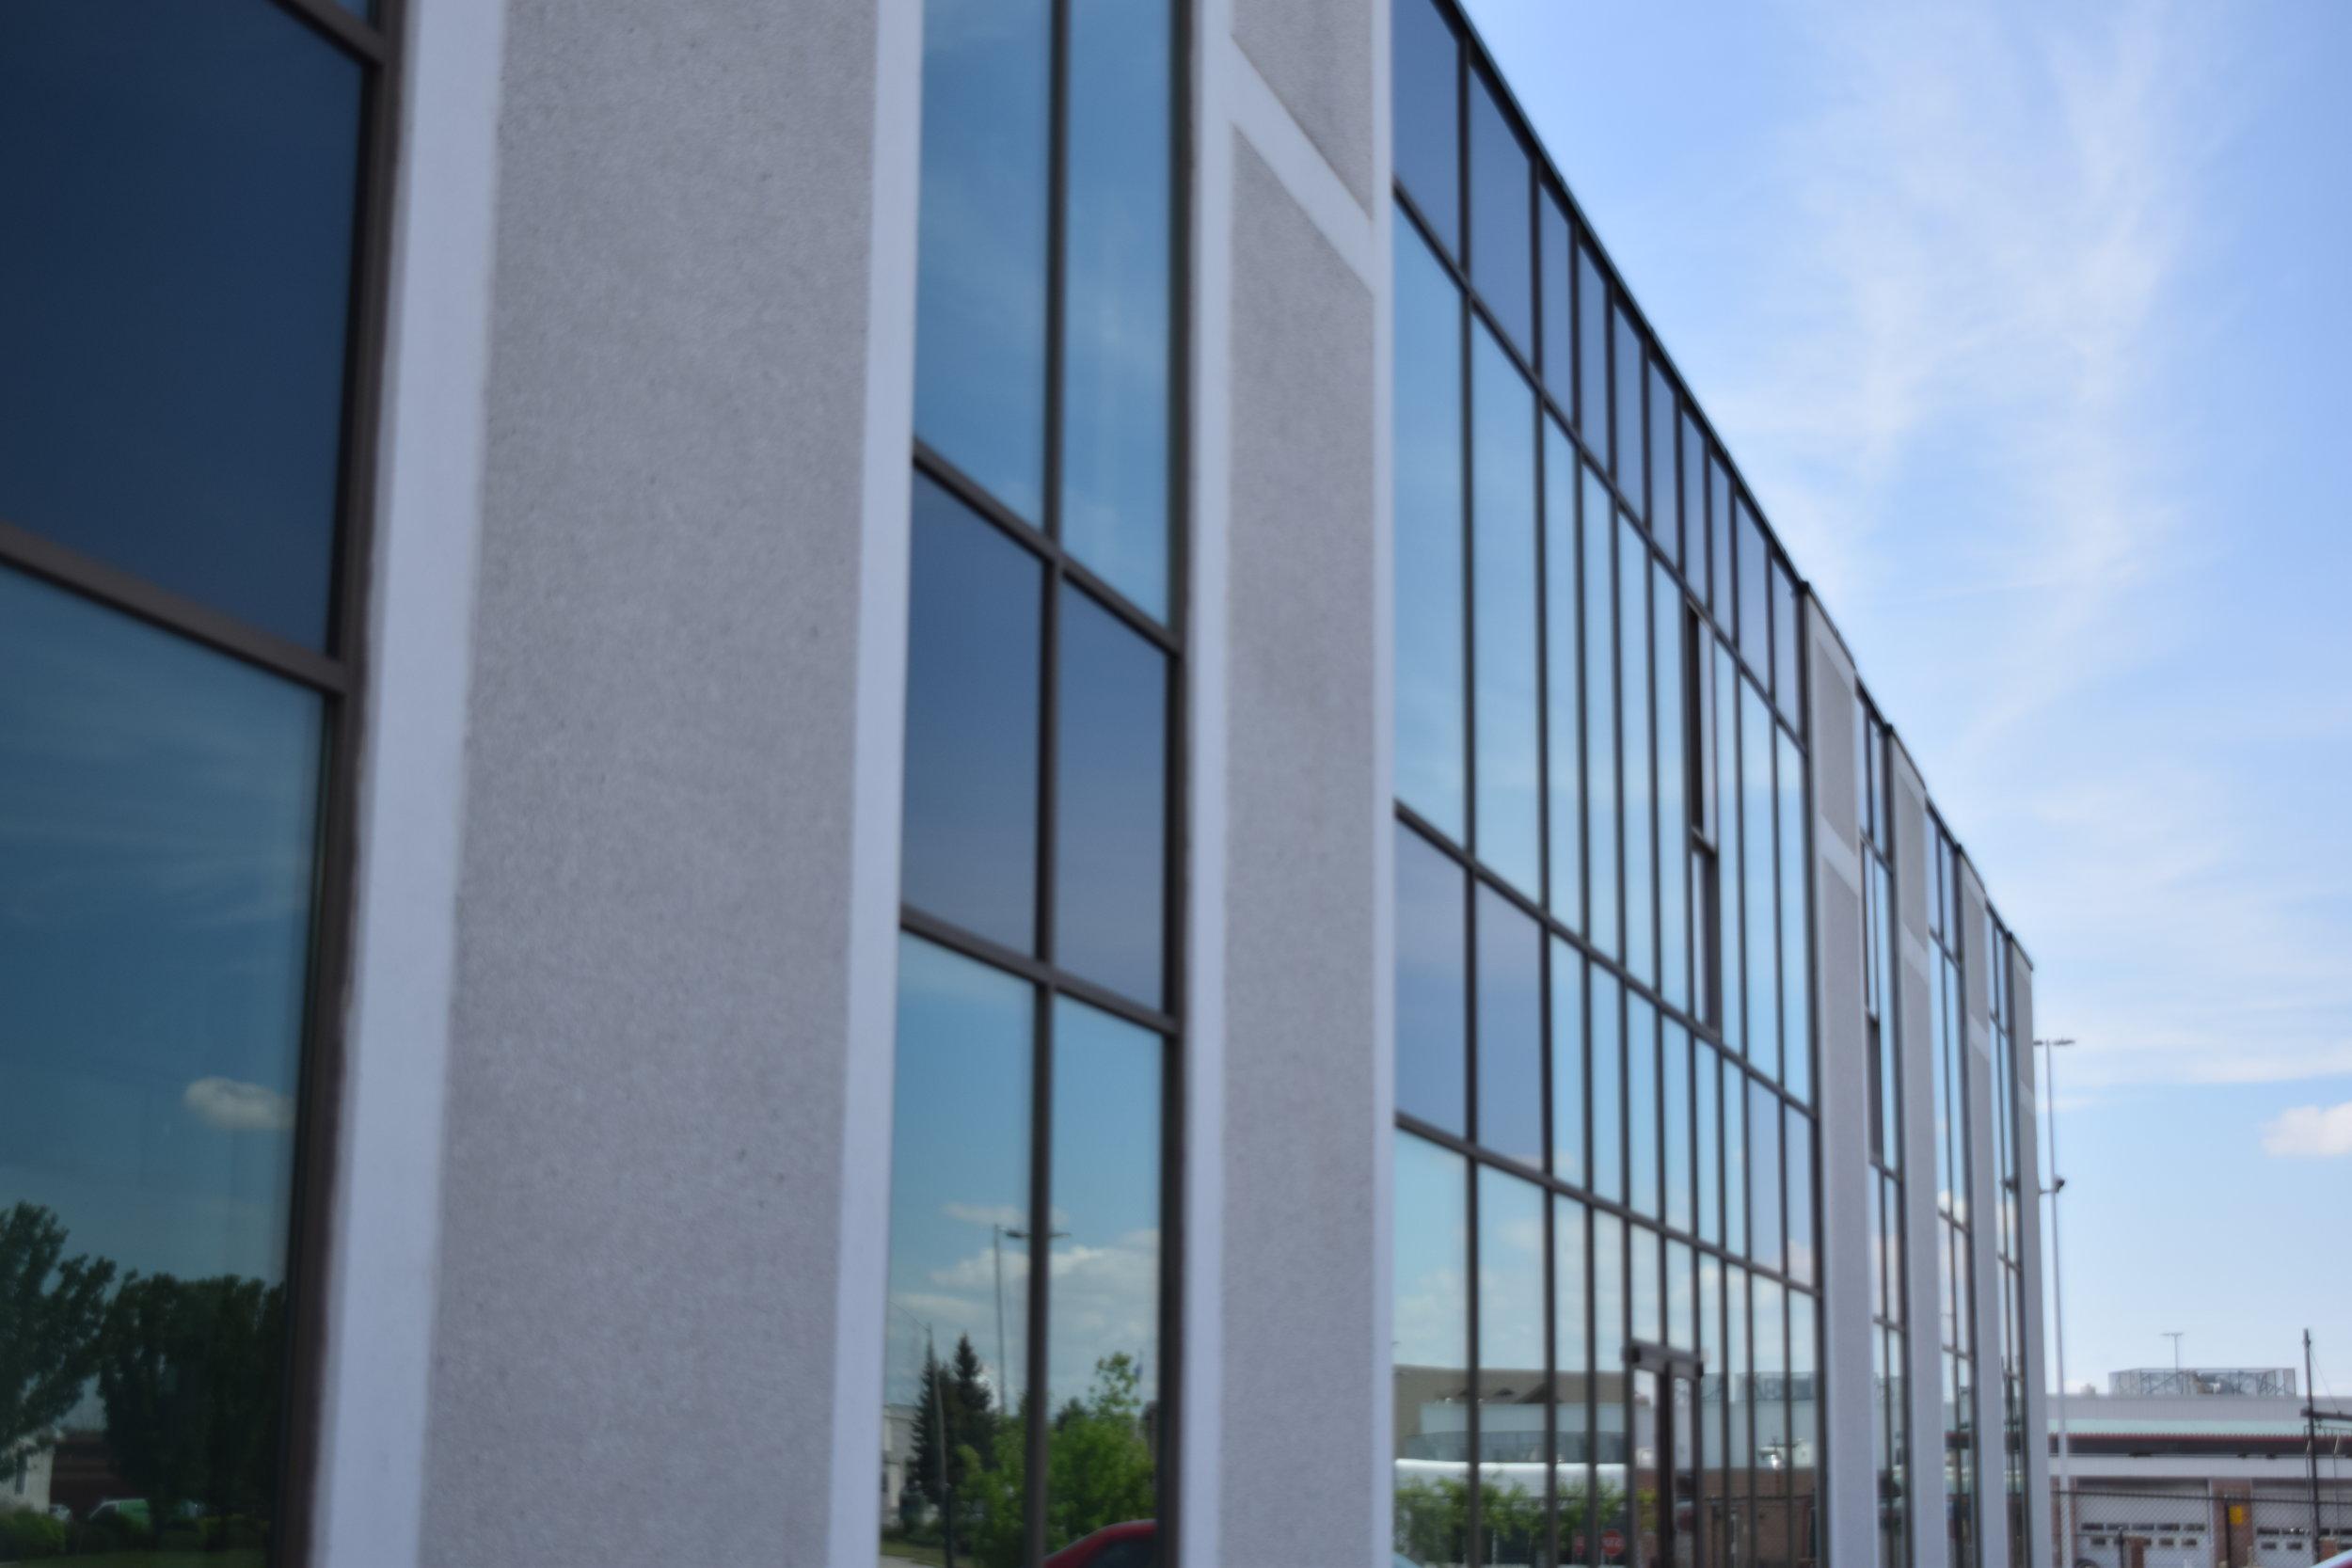 abf_facility.JPG